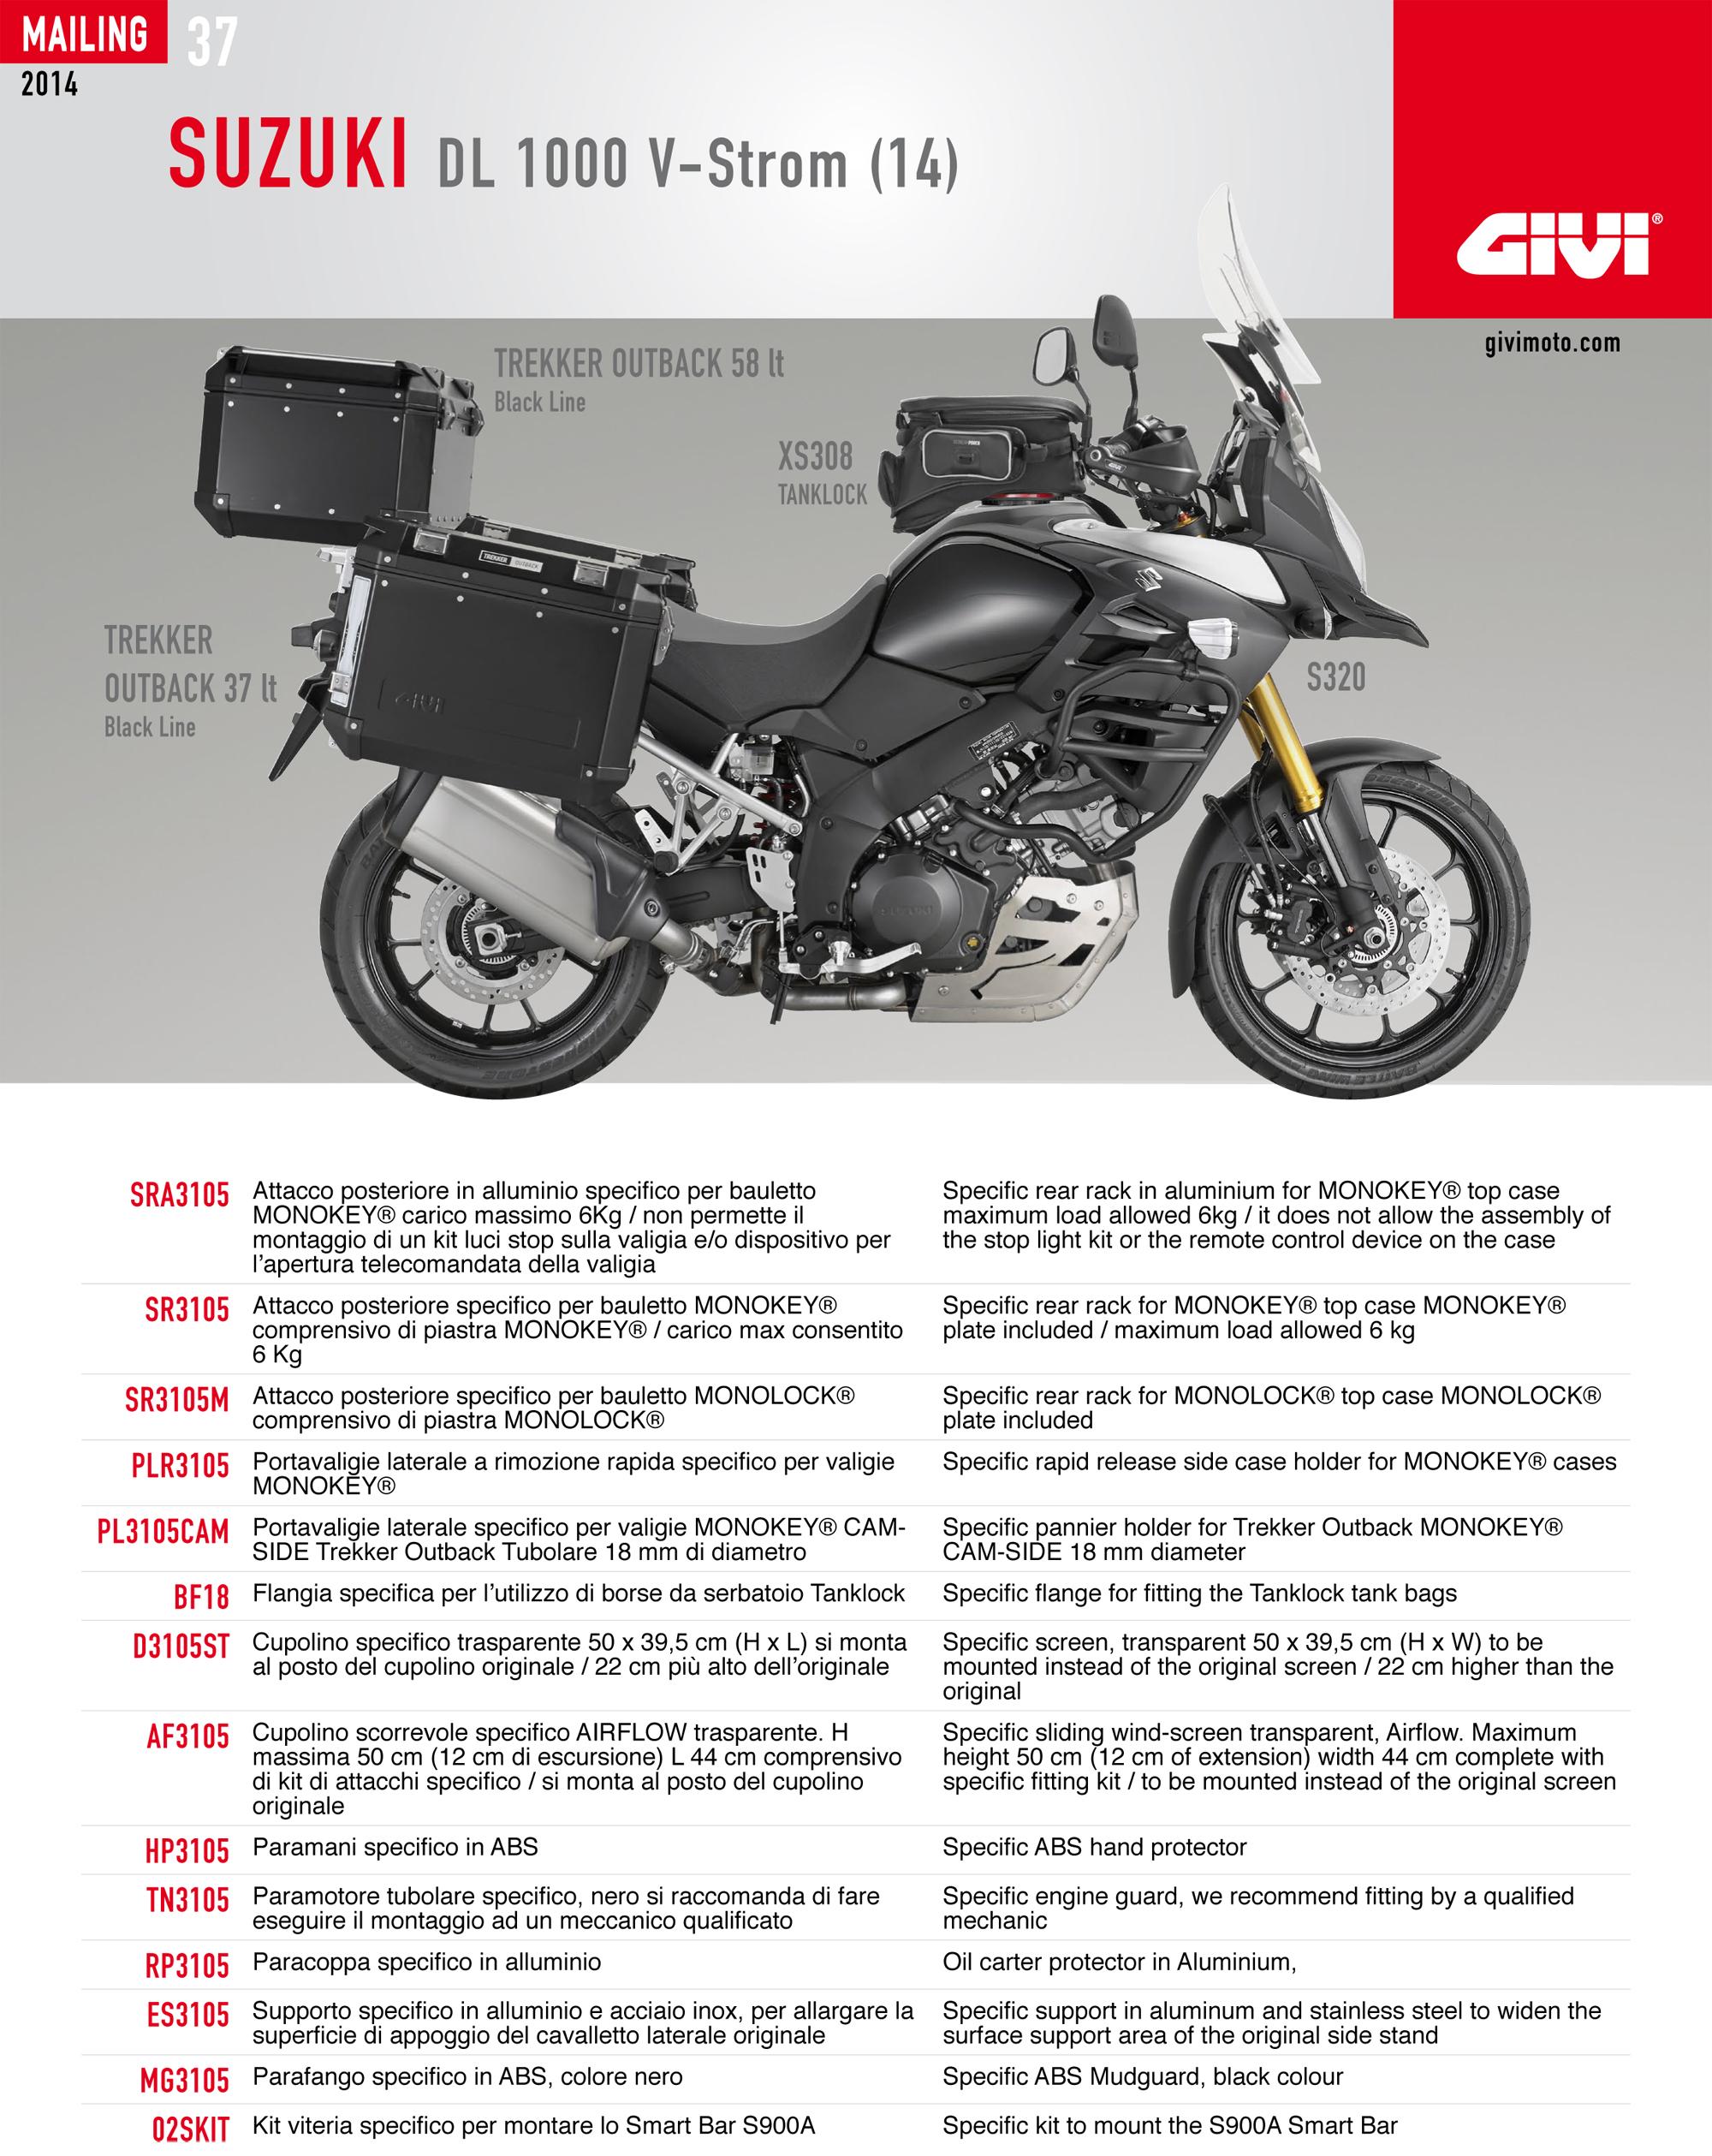 2012 suzuki v strom 650 service manual